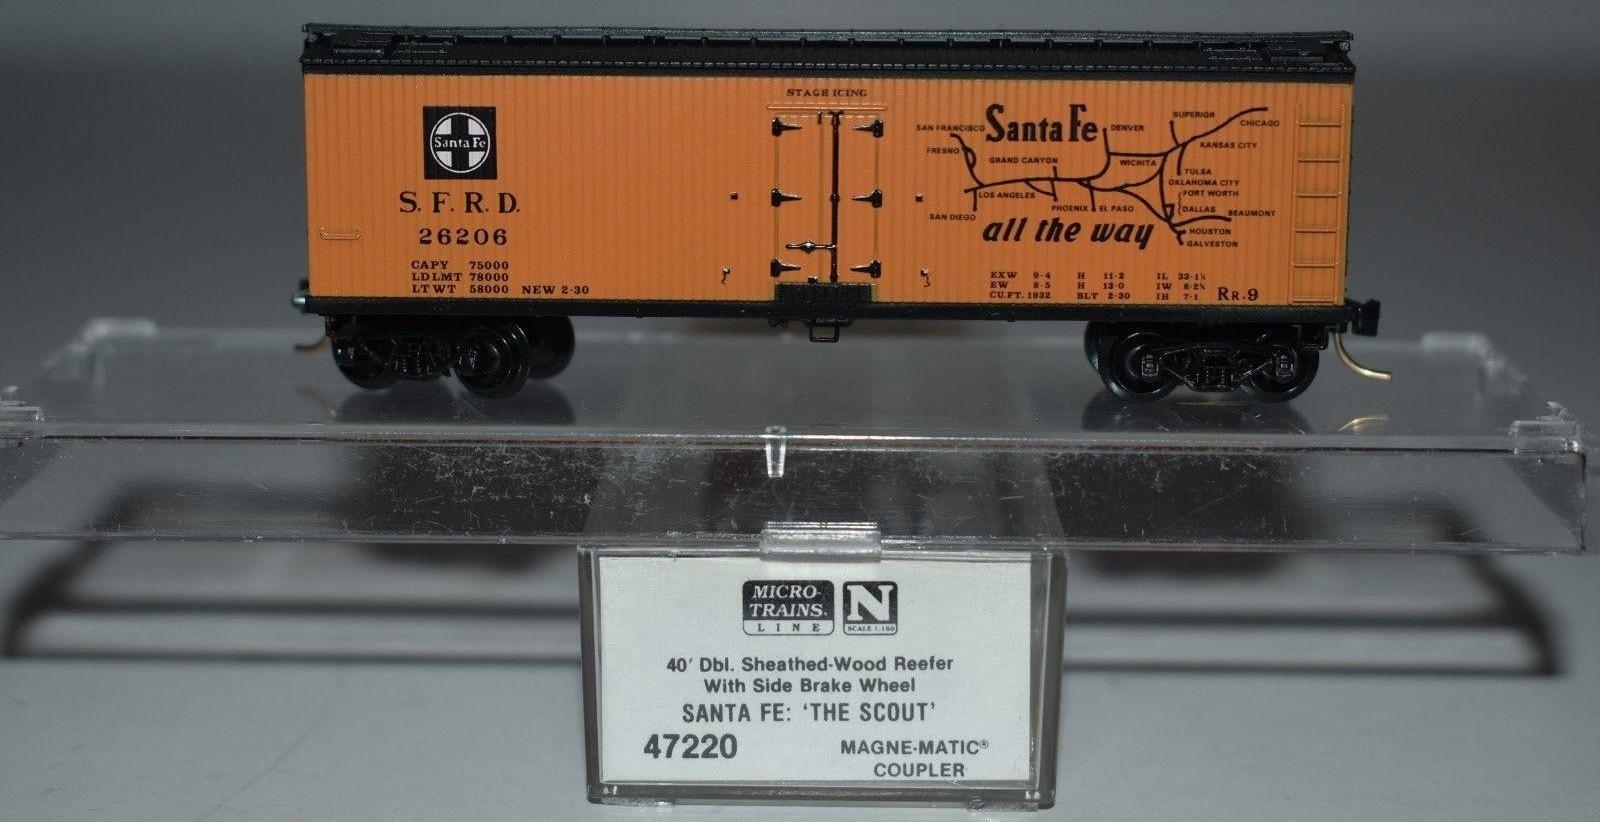 N Scale - Micro-Trains - 47220 - Reefer, Ice, Wood - Santa Fe - 26206